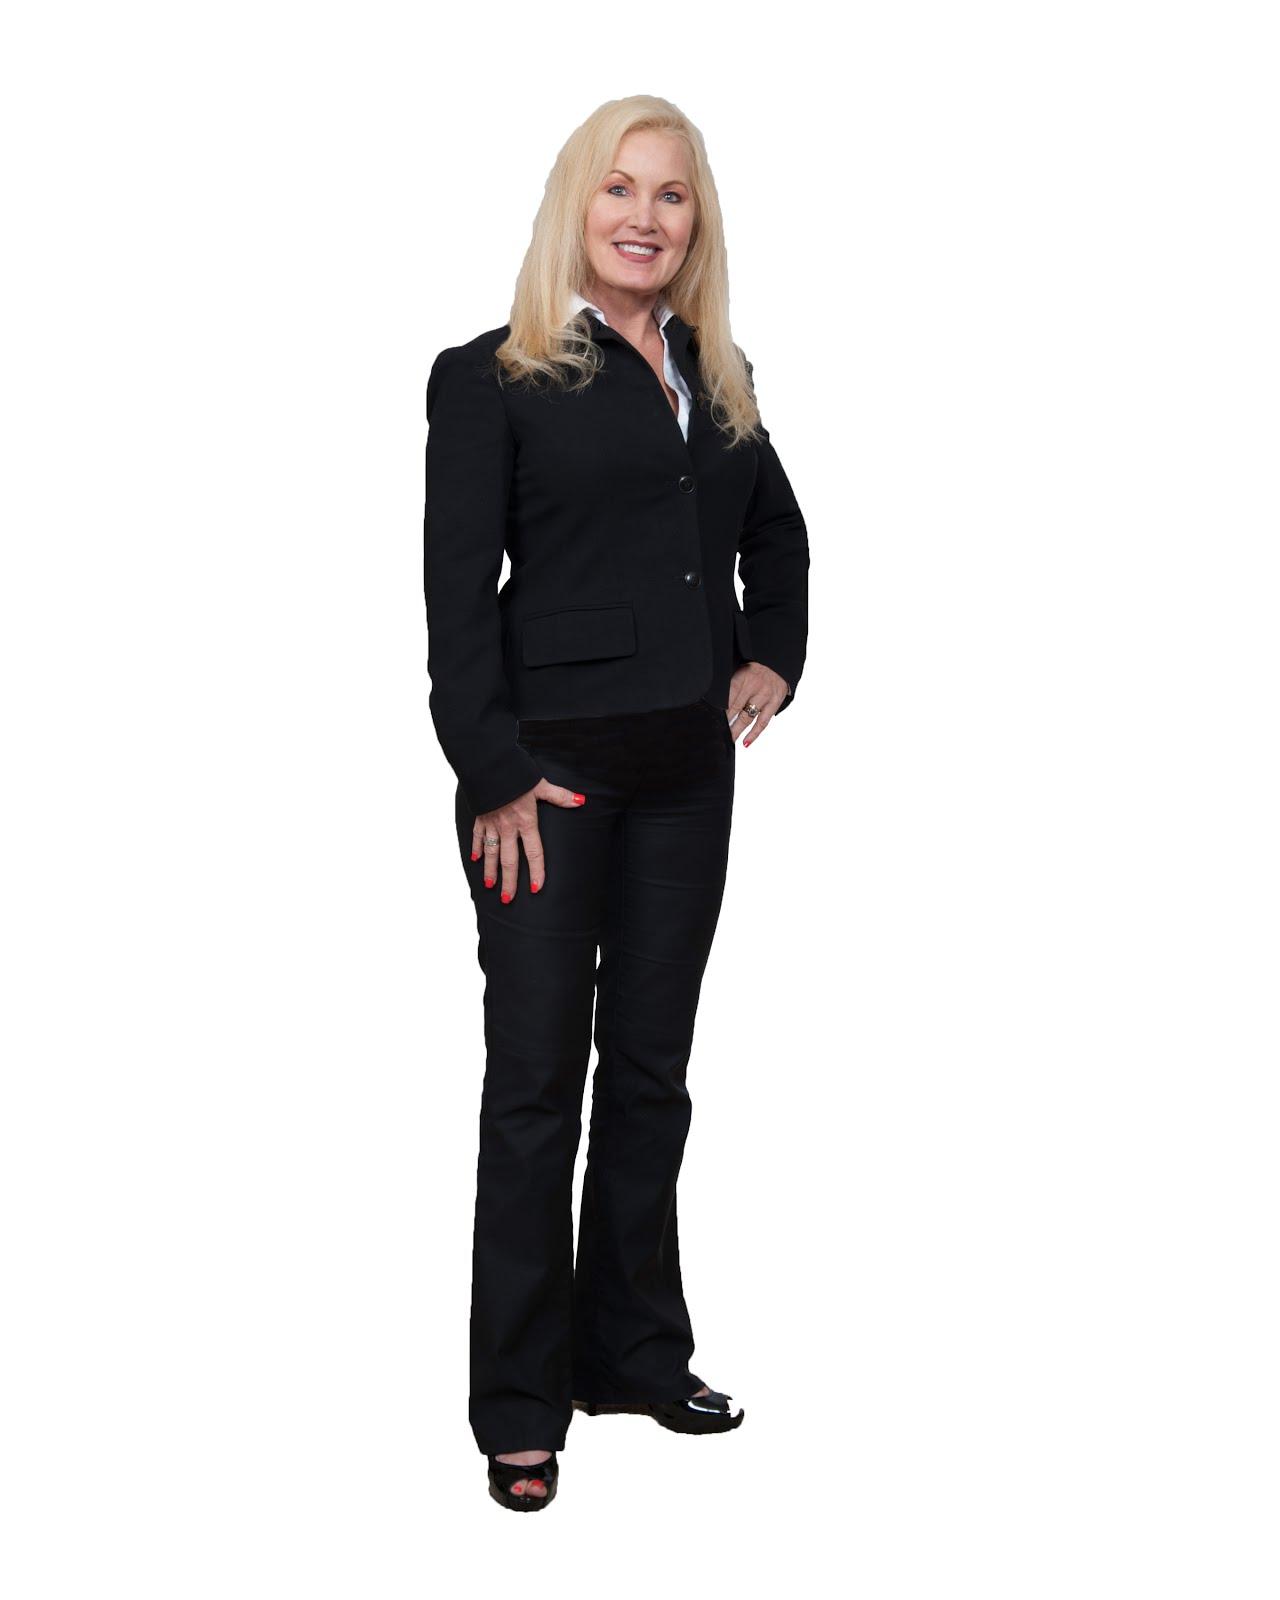 Lynette Silon-Laguna, Esq.